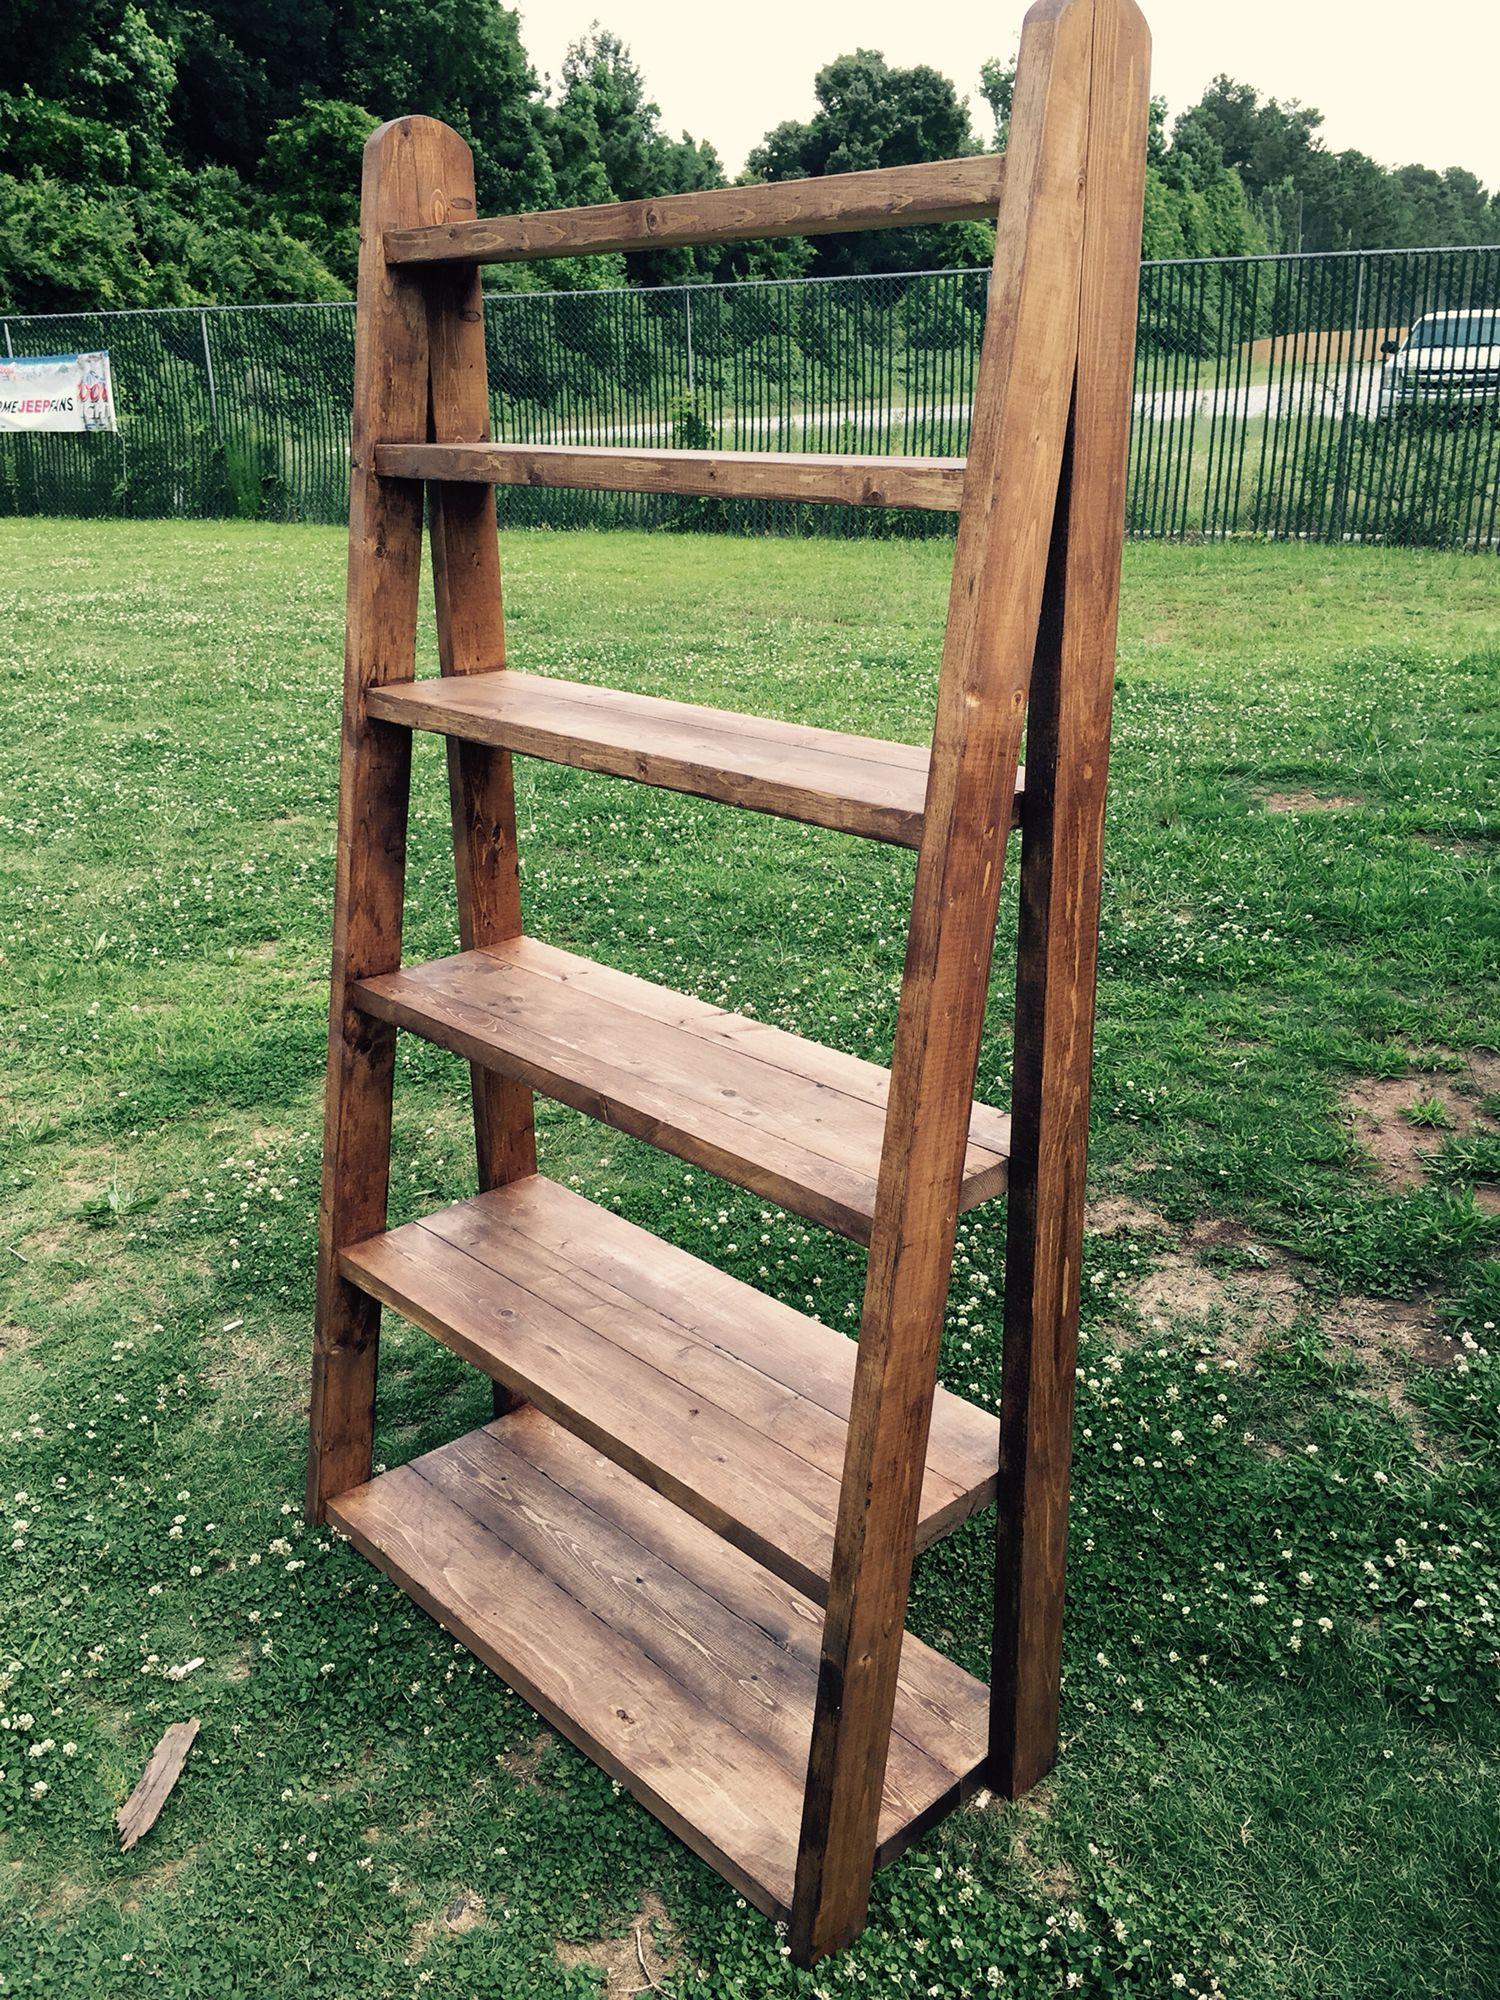 6 foot tall 3 1/2 wide ladder bookshelf | Wood ladder, Furniture